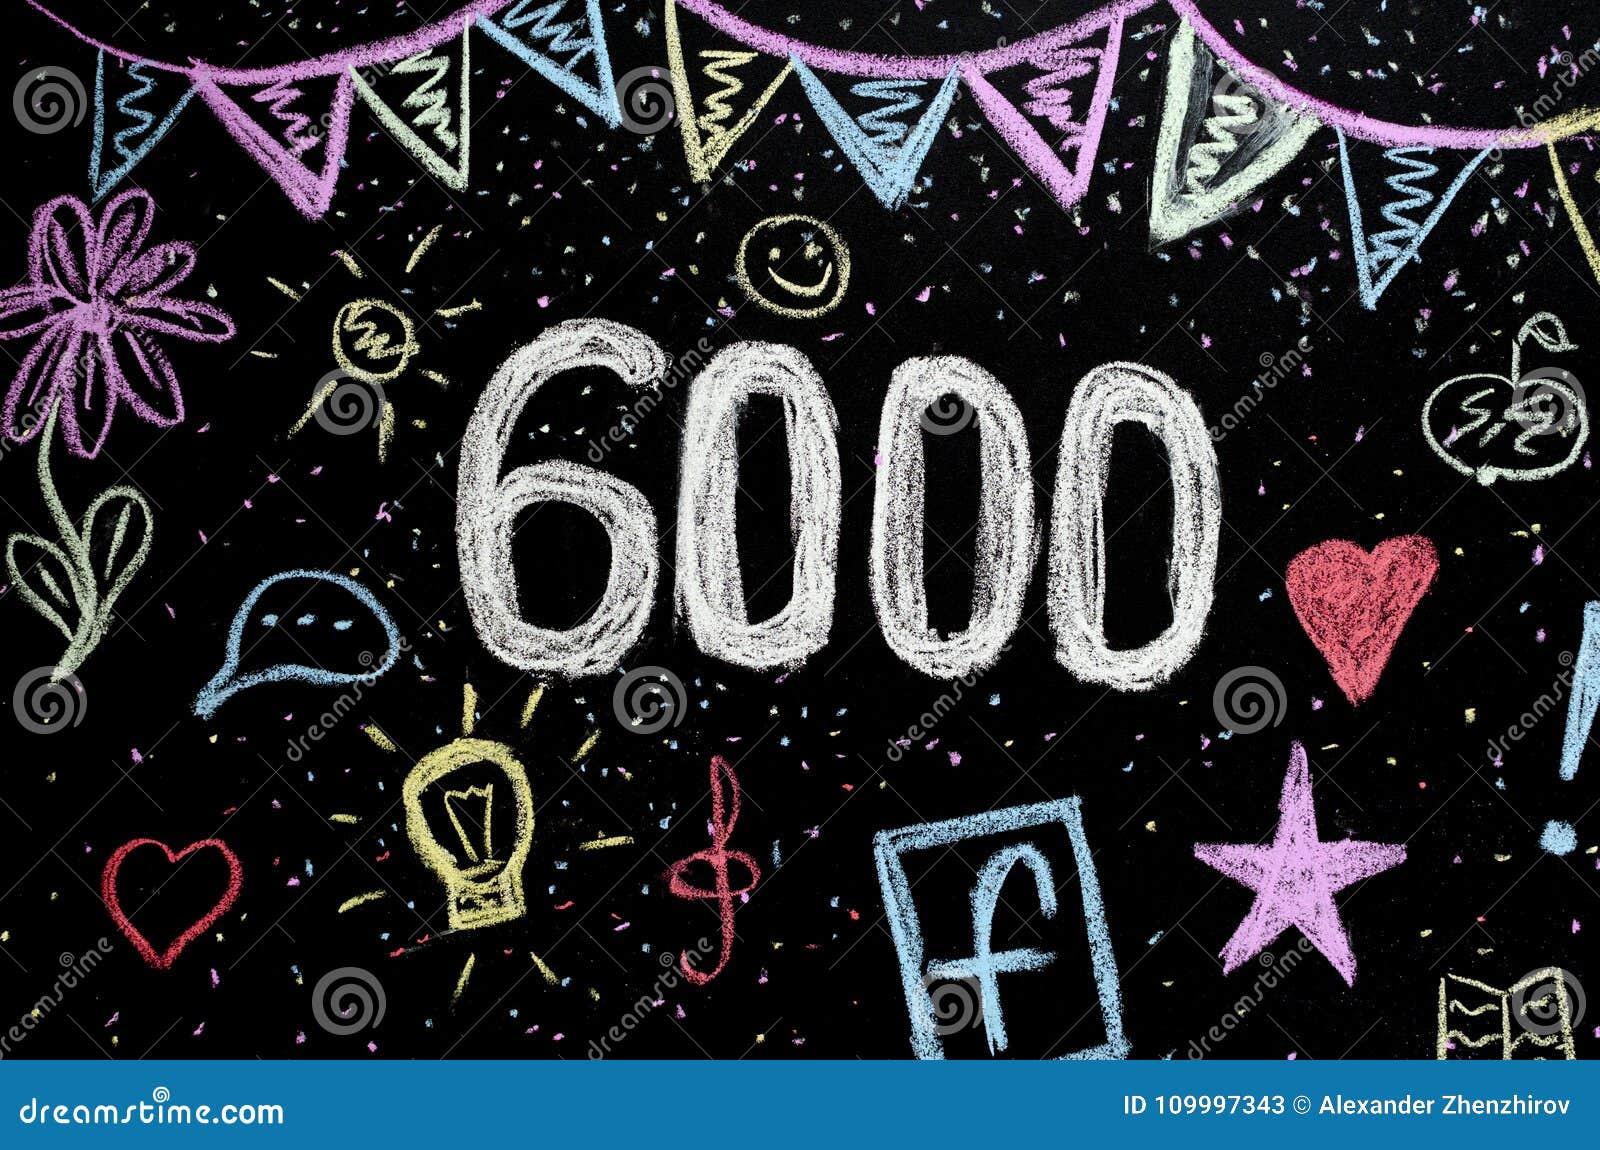 6 000 kredowy rysunek na blackboard